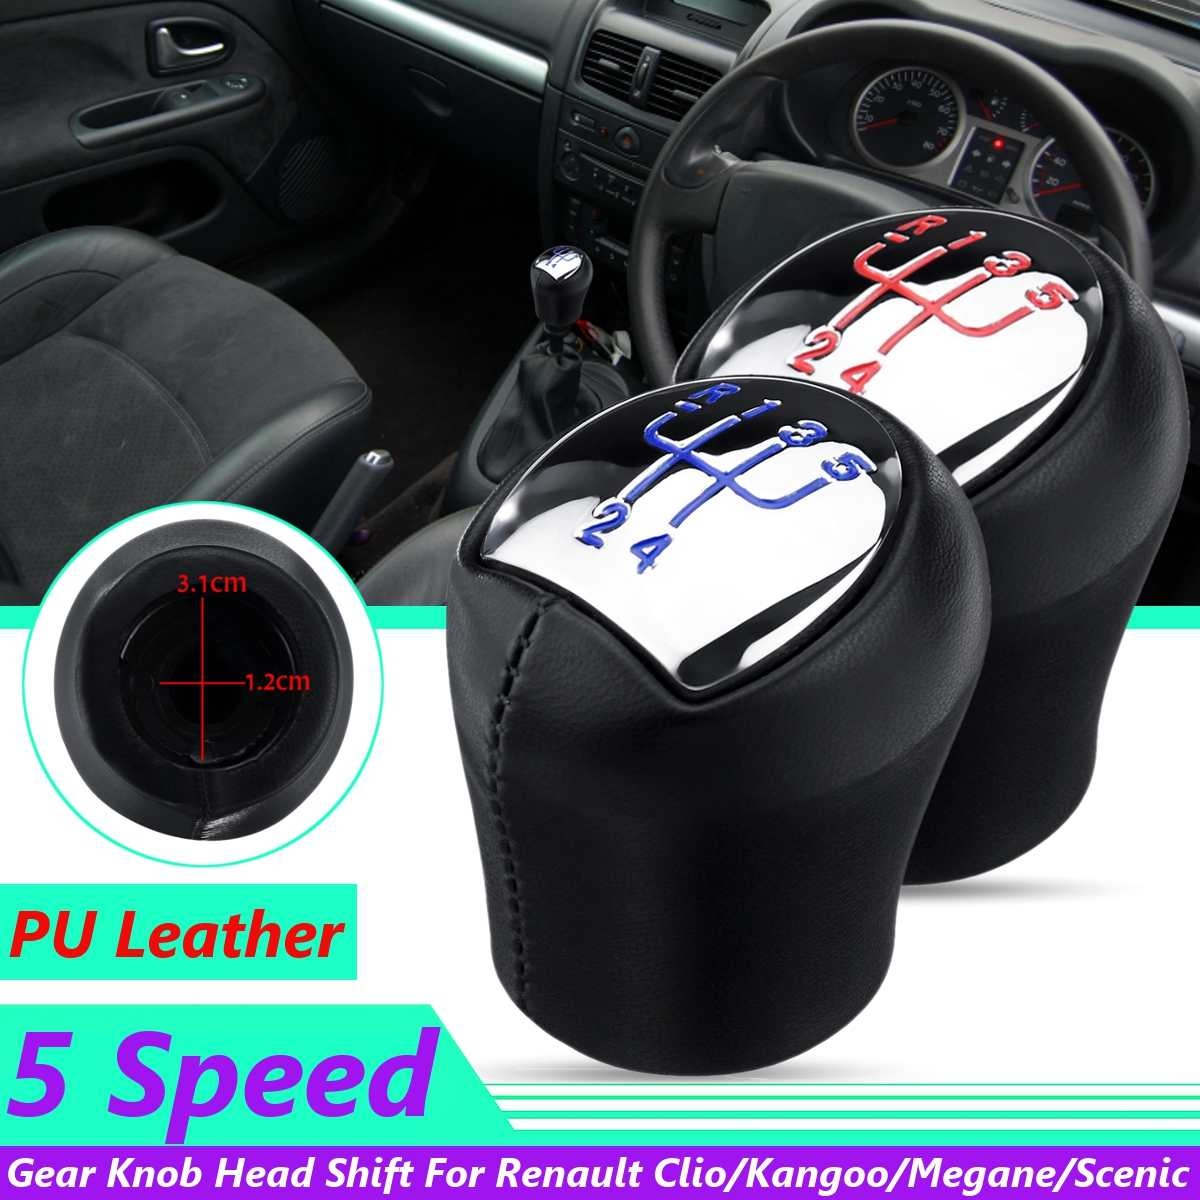 Renault Modus Espace Twingo Kangoo Gear Knob /& Shift Stick Sleeve Adapter Lever